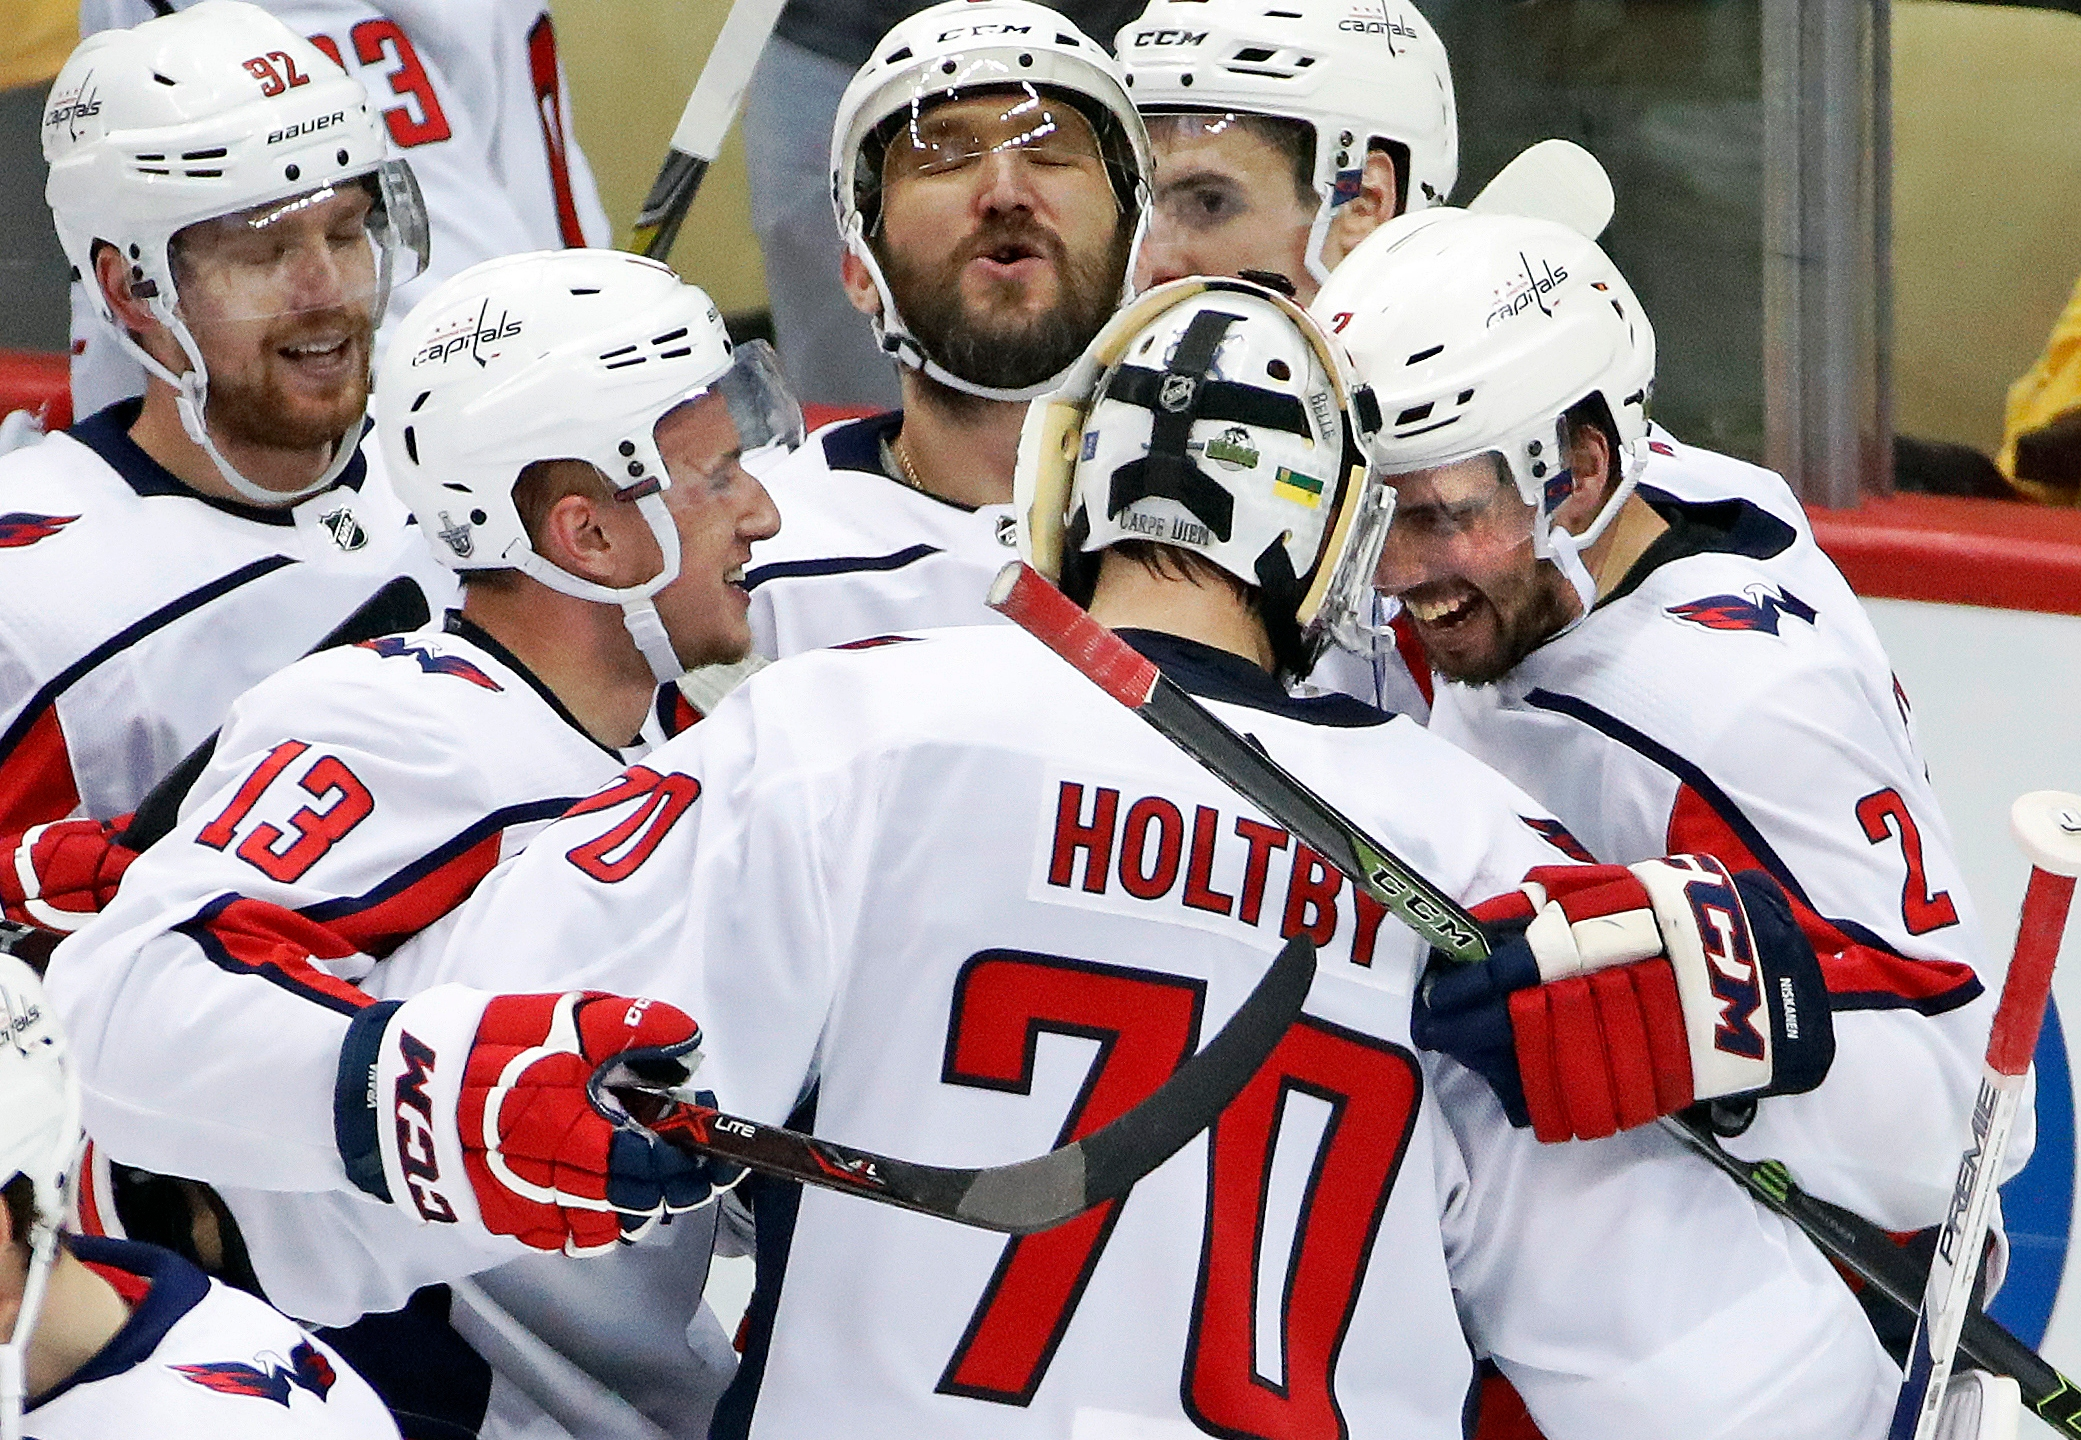 Capitals_Penguins_Hockey_55250-159532.jpg79501849